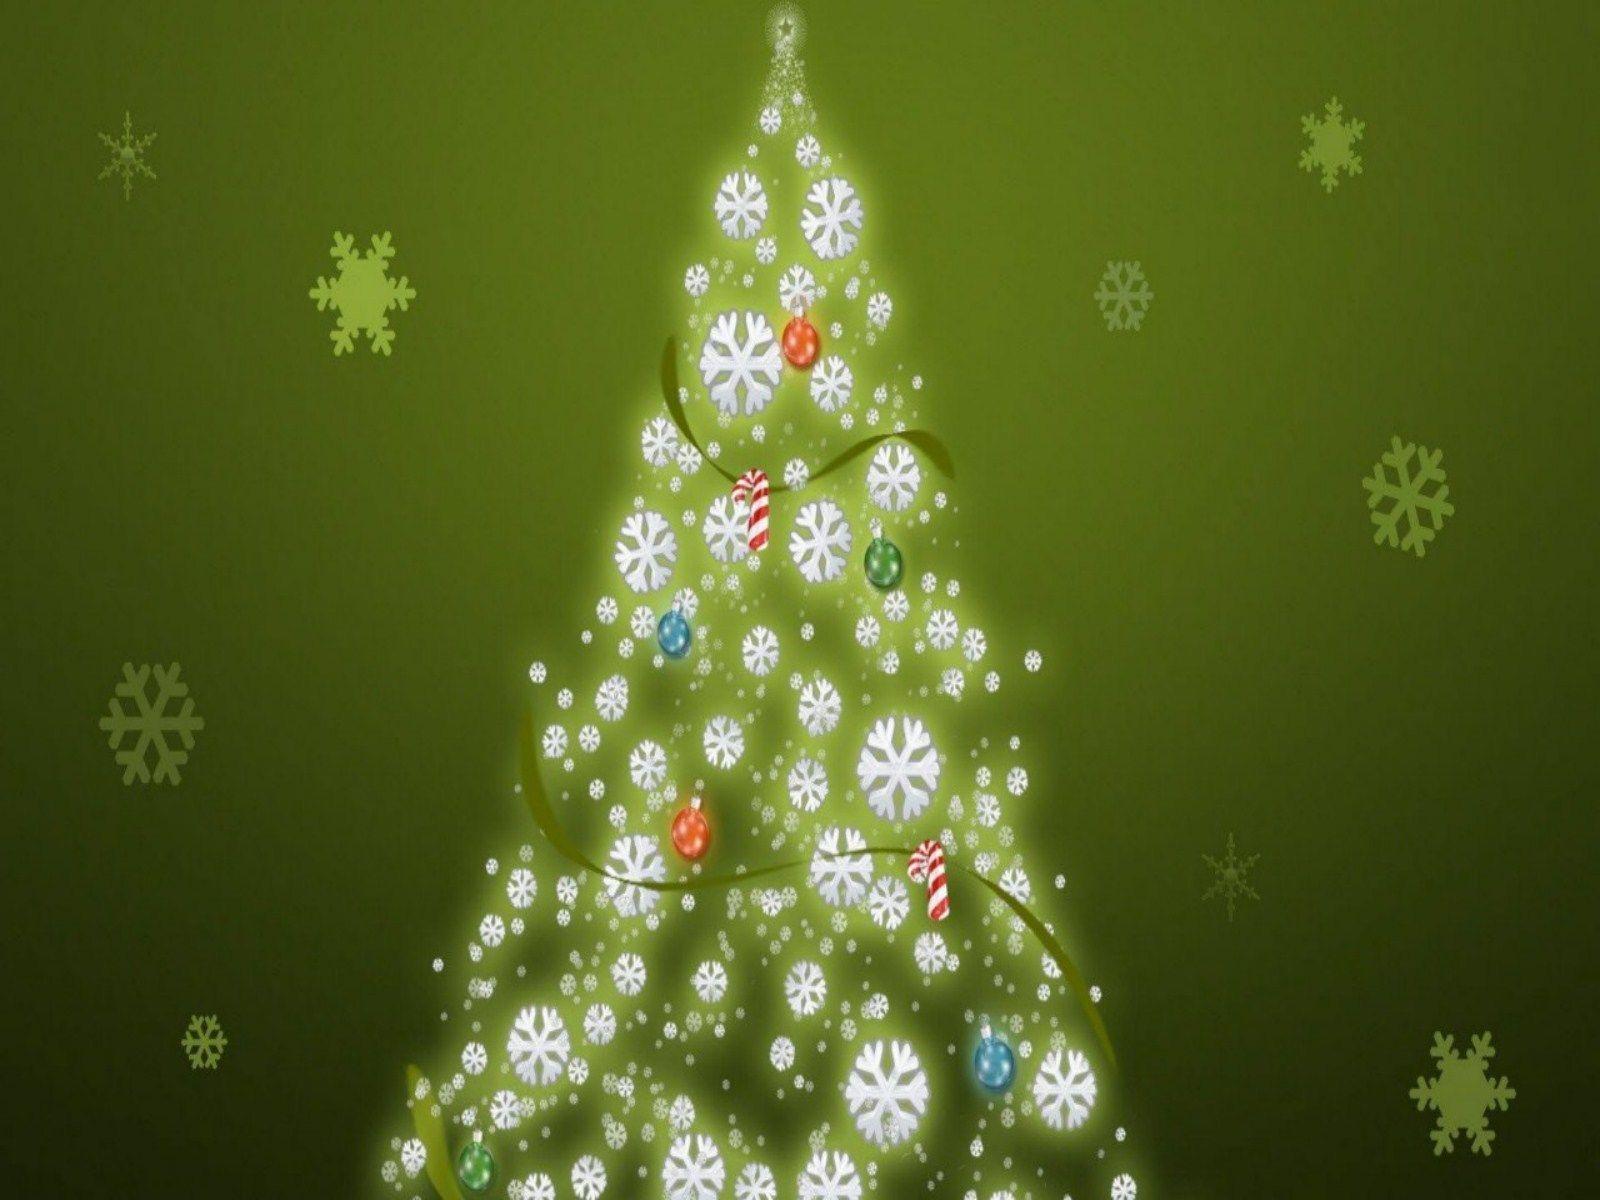 tree desktop background - photo #42